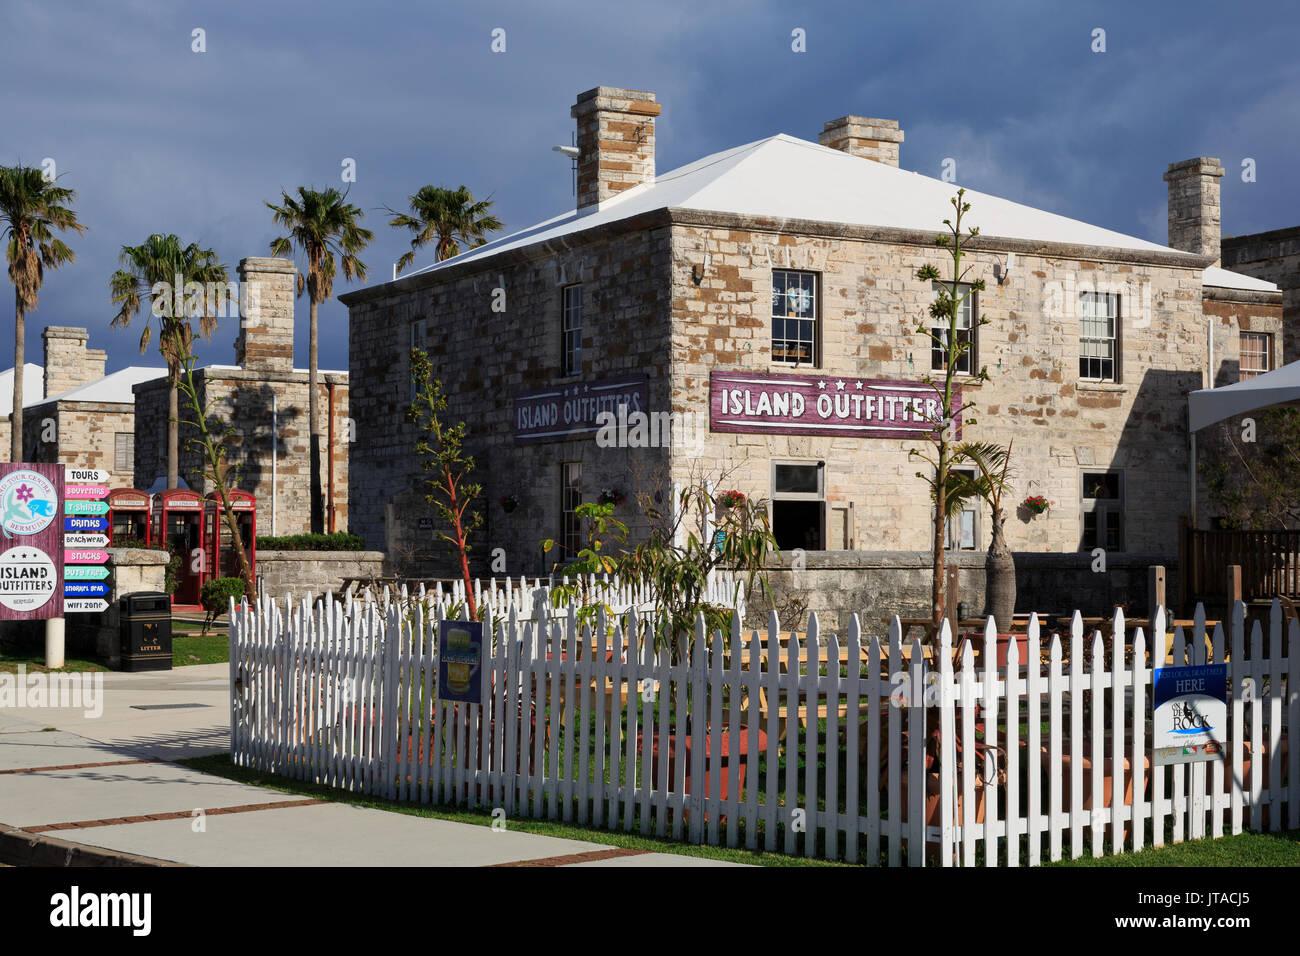 Royal Naval Dockyard, West End, Sandys Parish, Bermuda, Central America - Stock Image